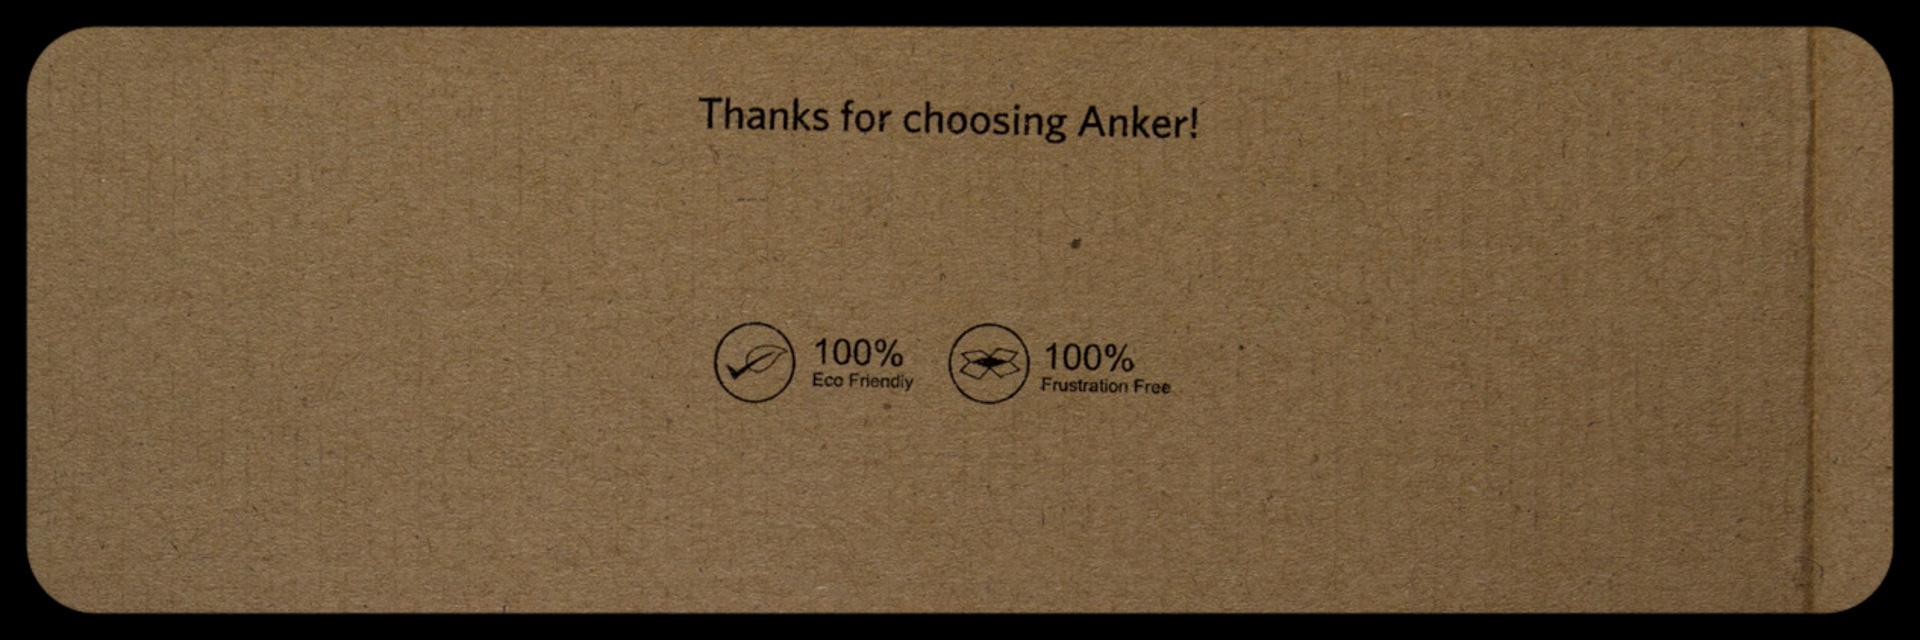 Review Anker 2. Gen. Astro E4 13000mAh